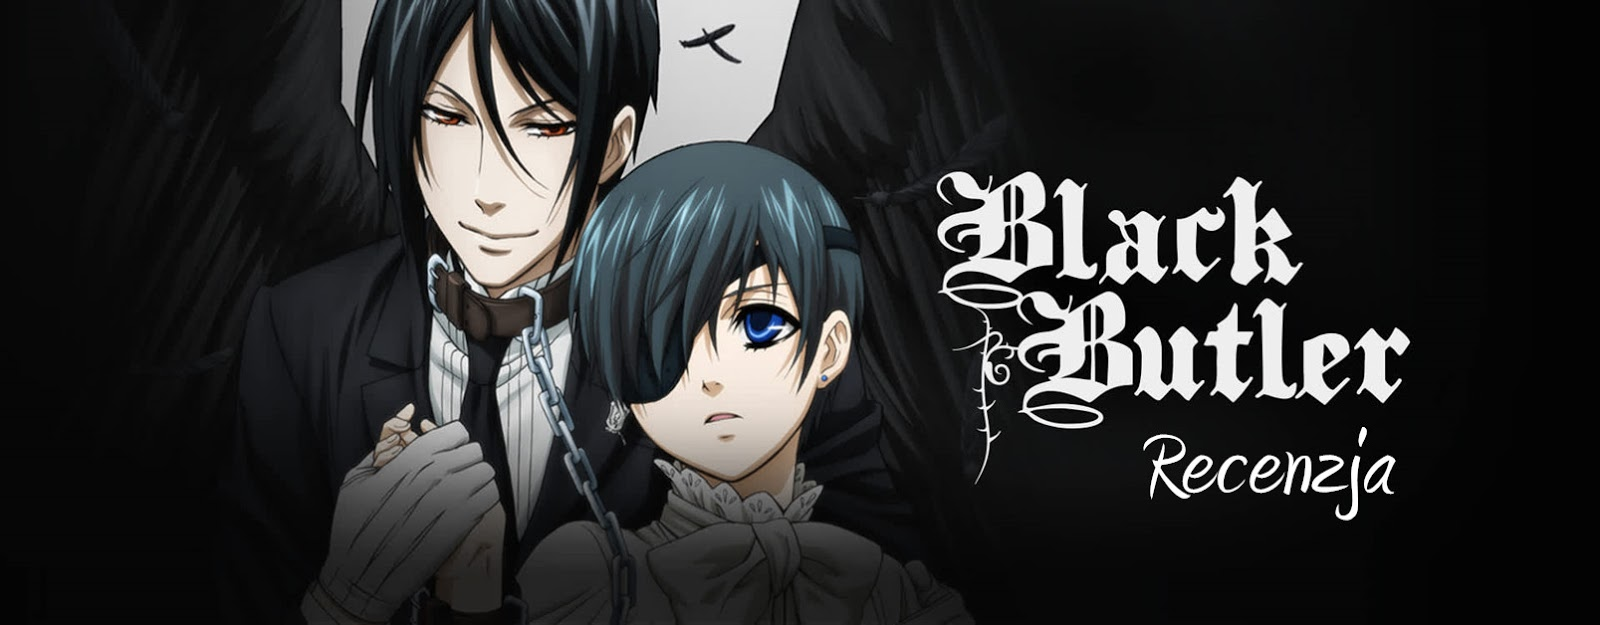 Recenzja forum Black Butler